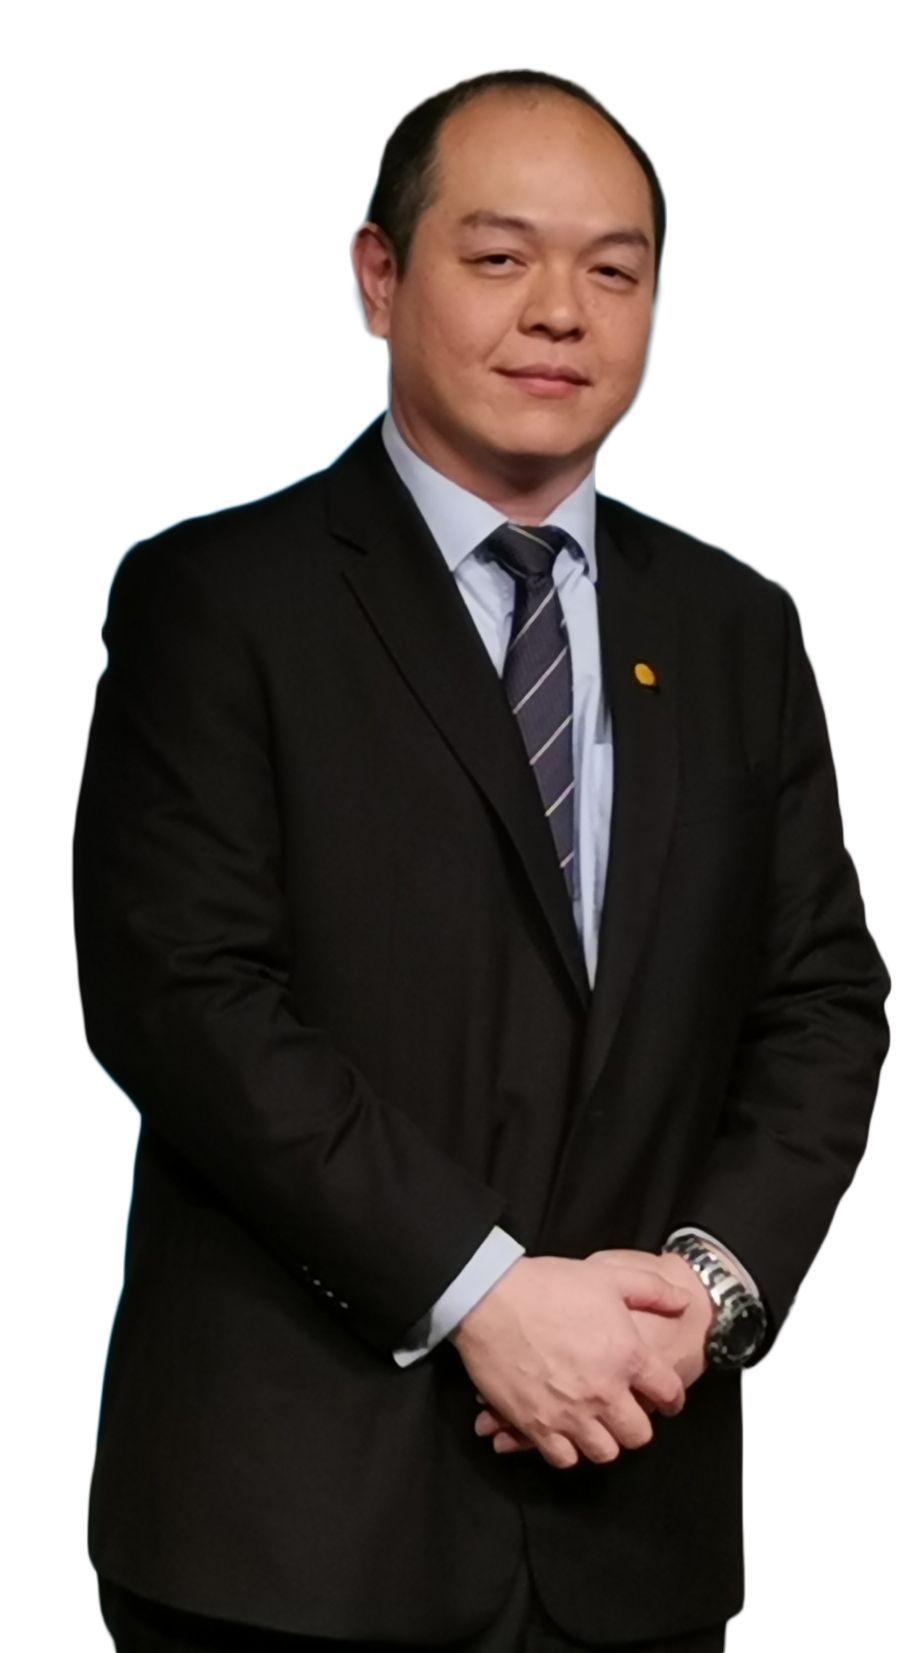 LGMS chief executive officer Fong Choong Fook